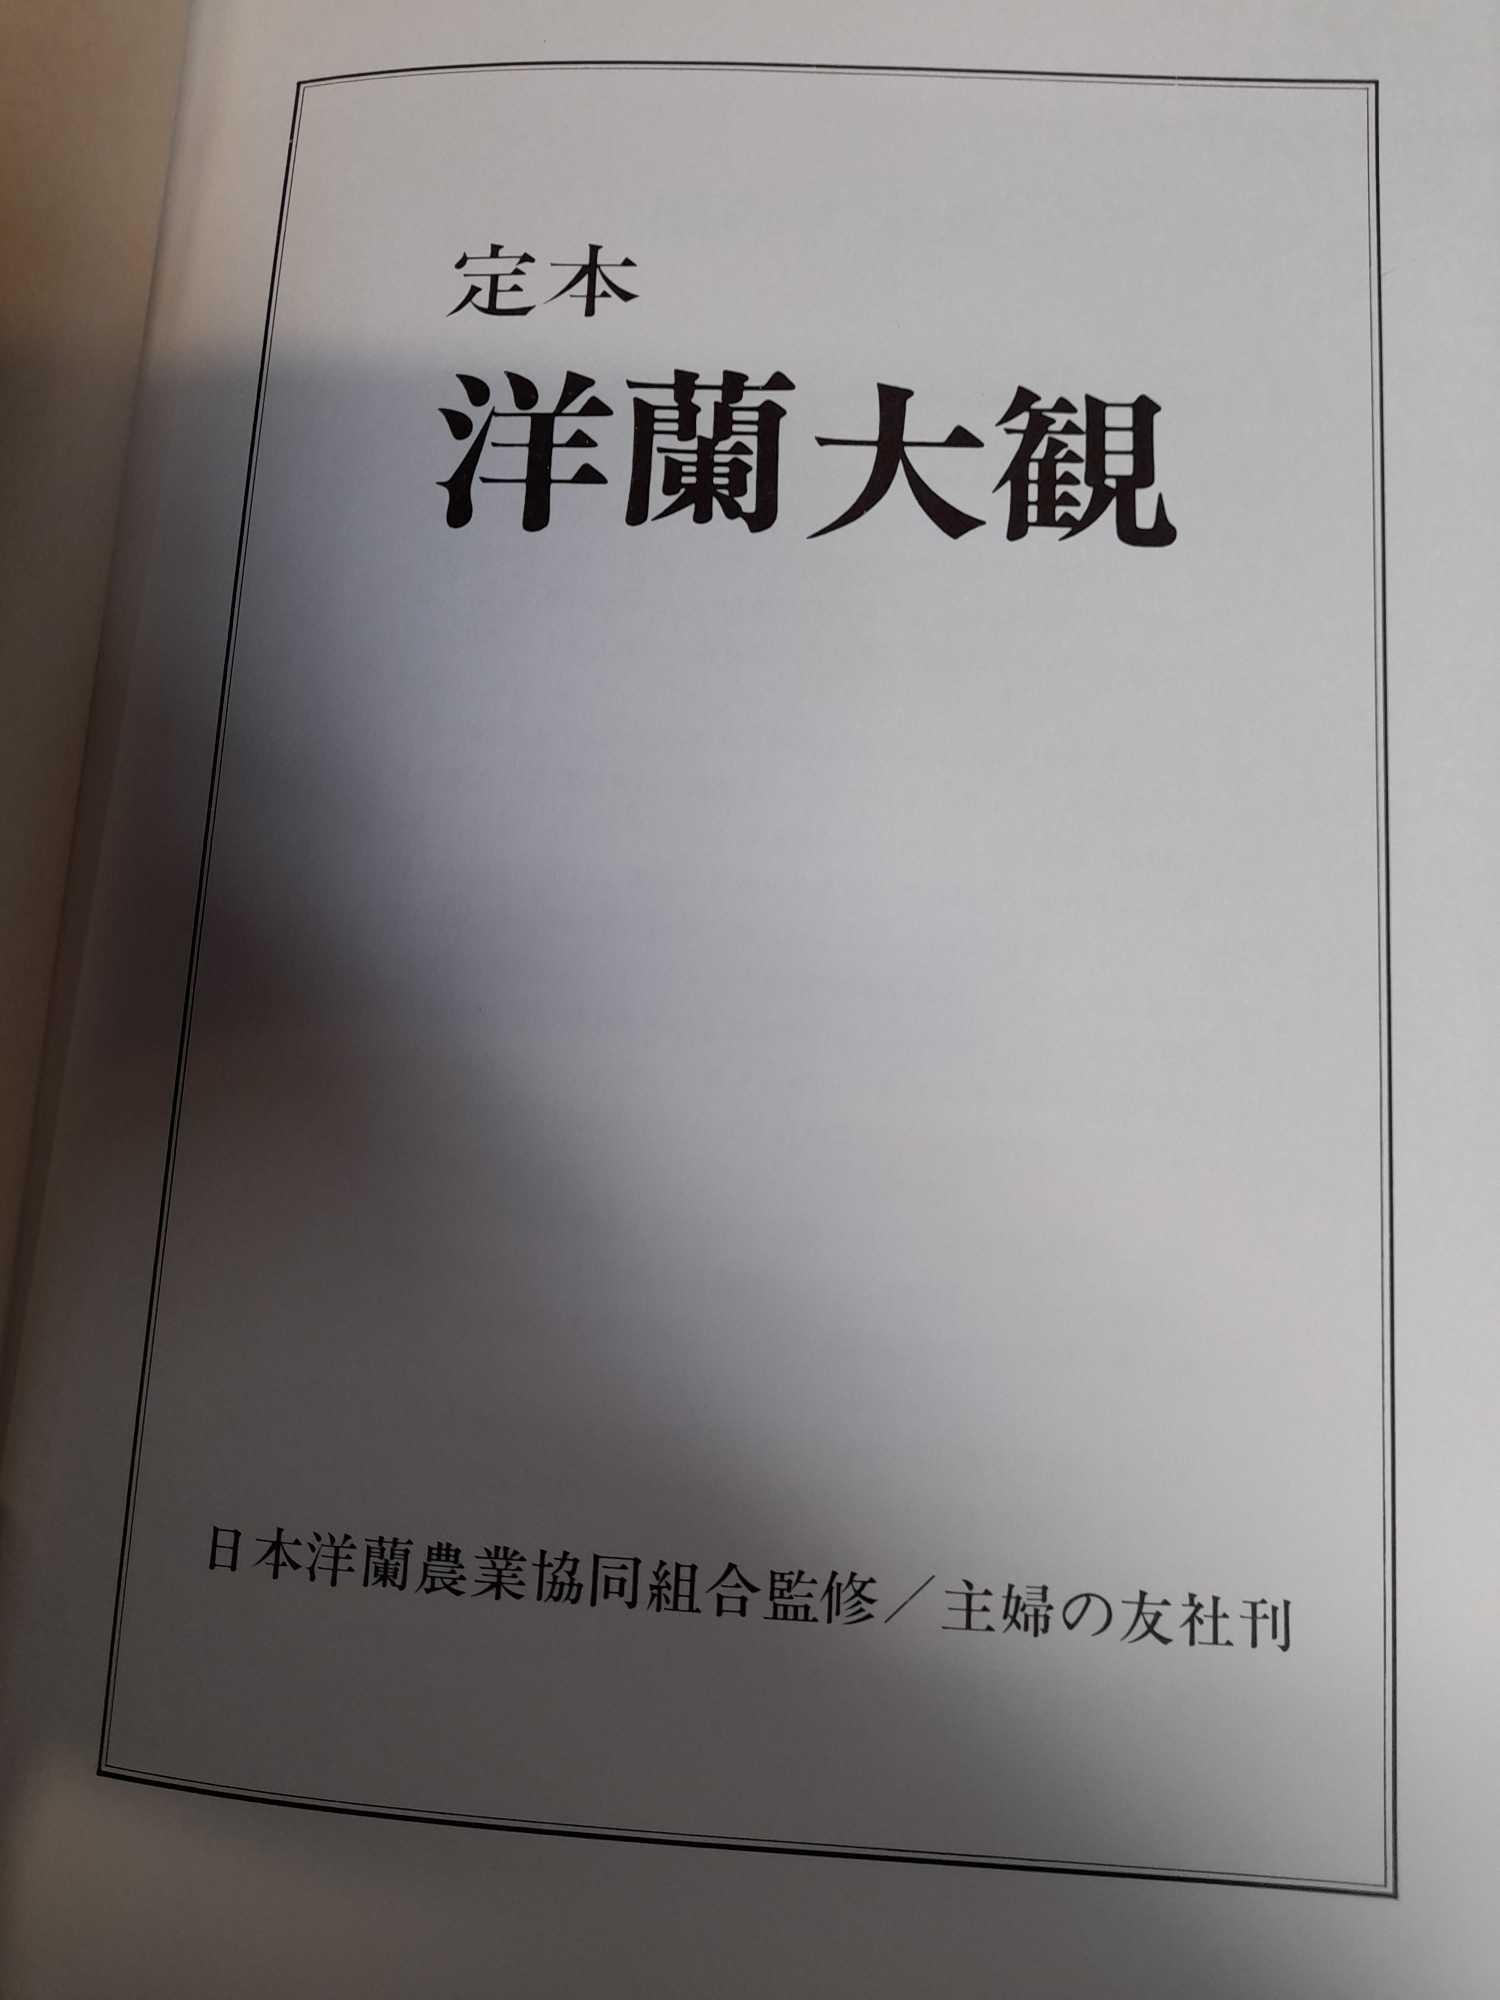 2 ORIENTAL BOOKS - Image 3 of 14